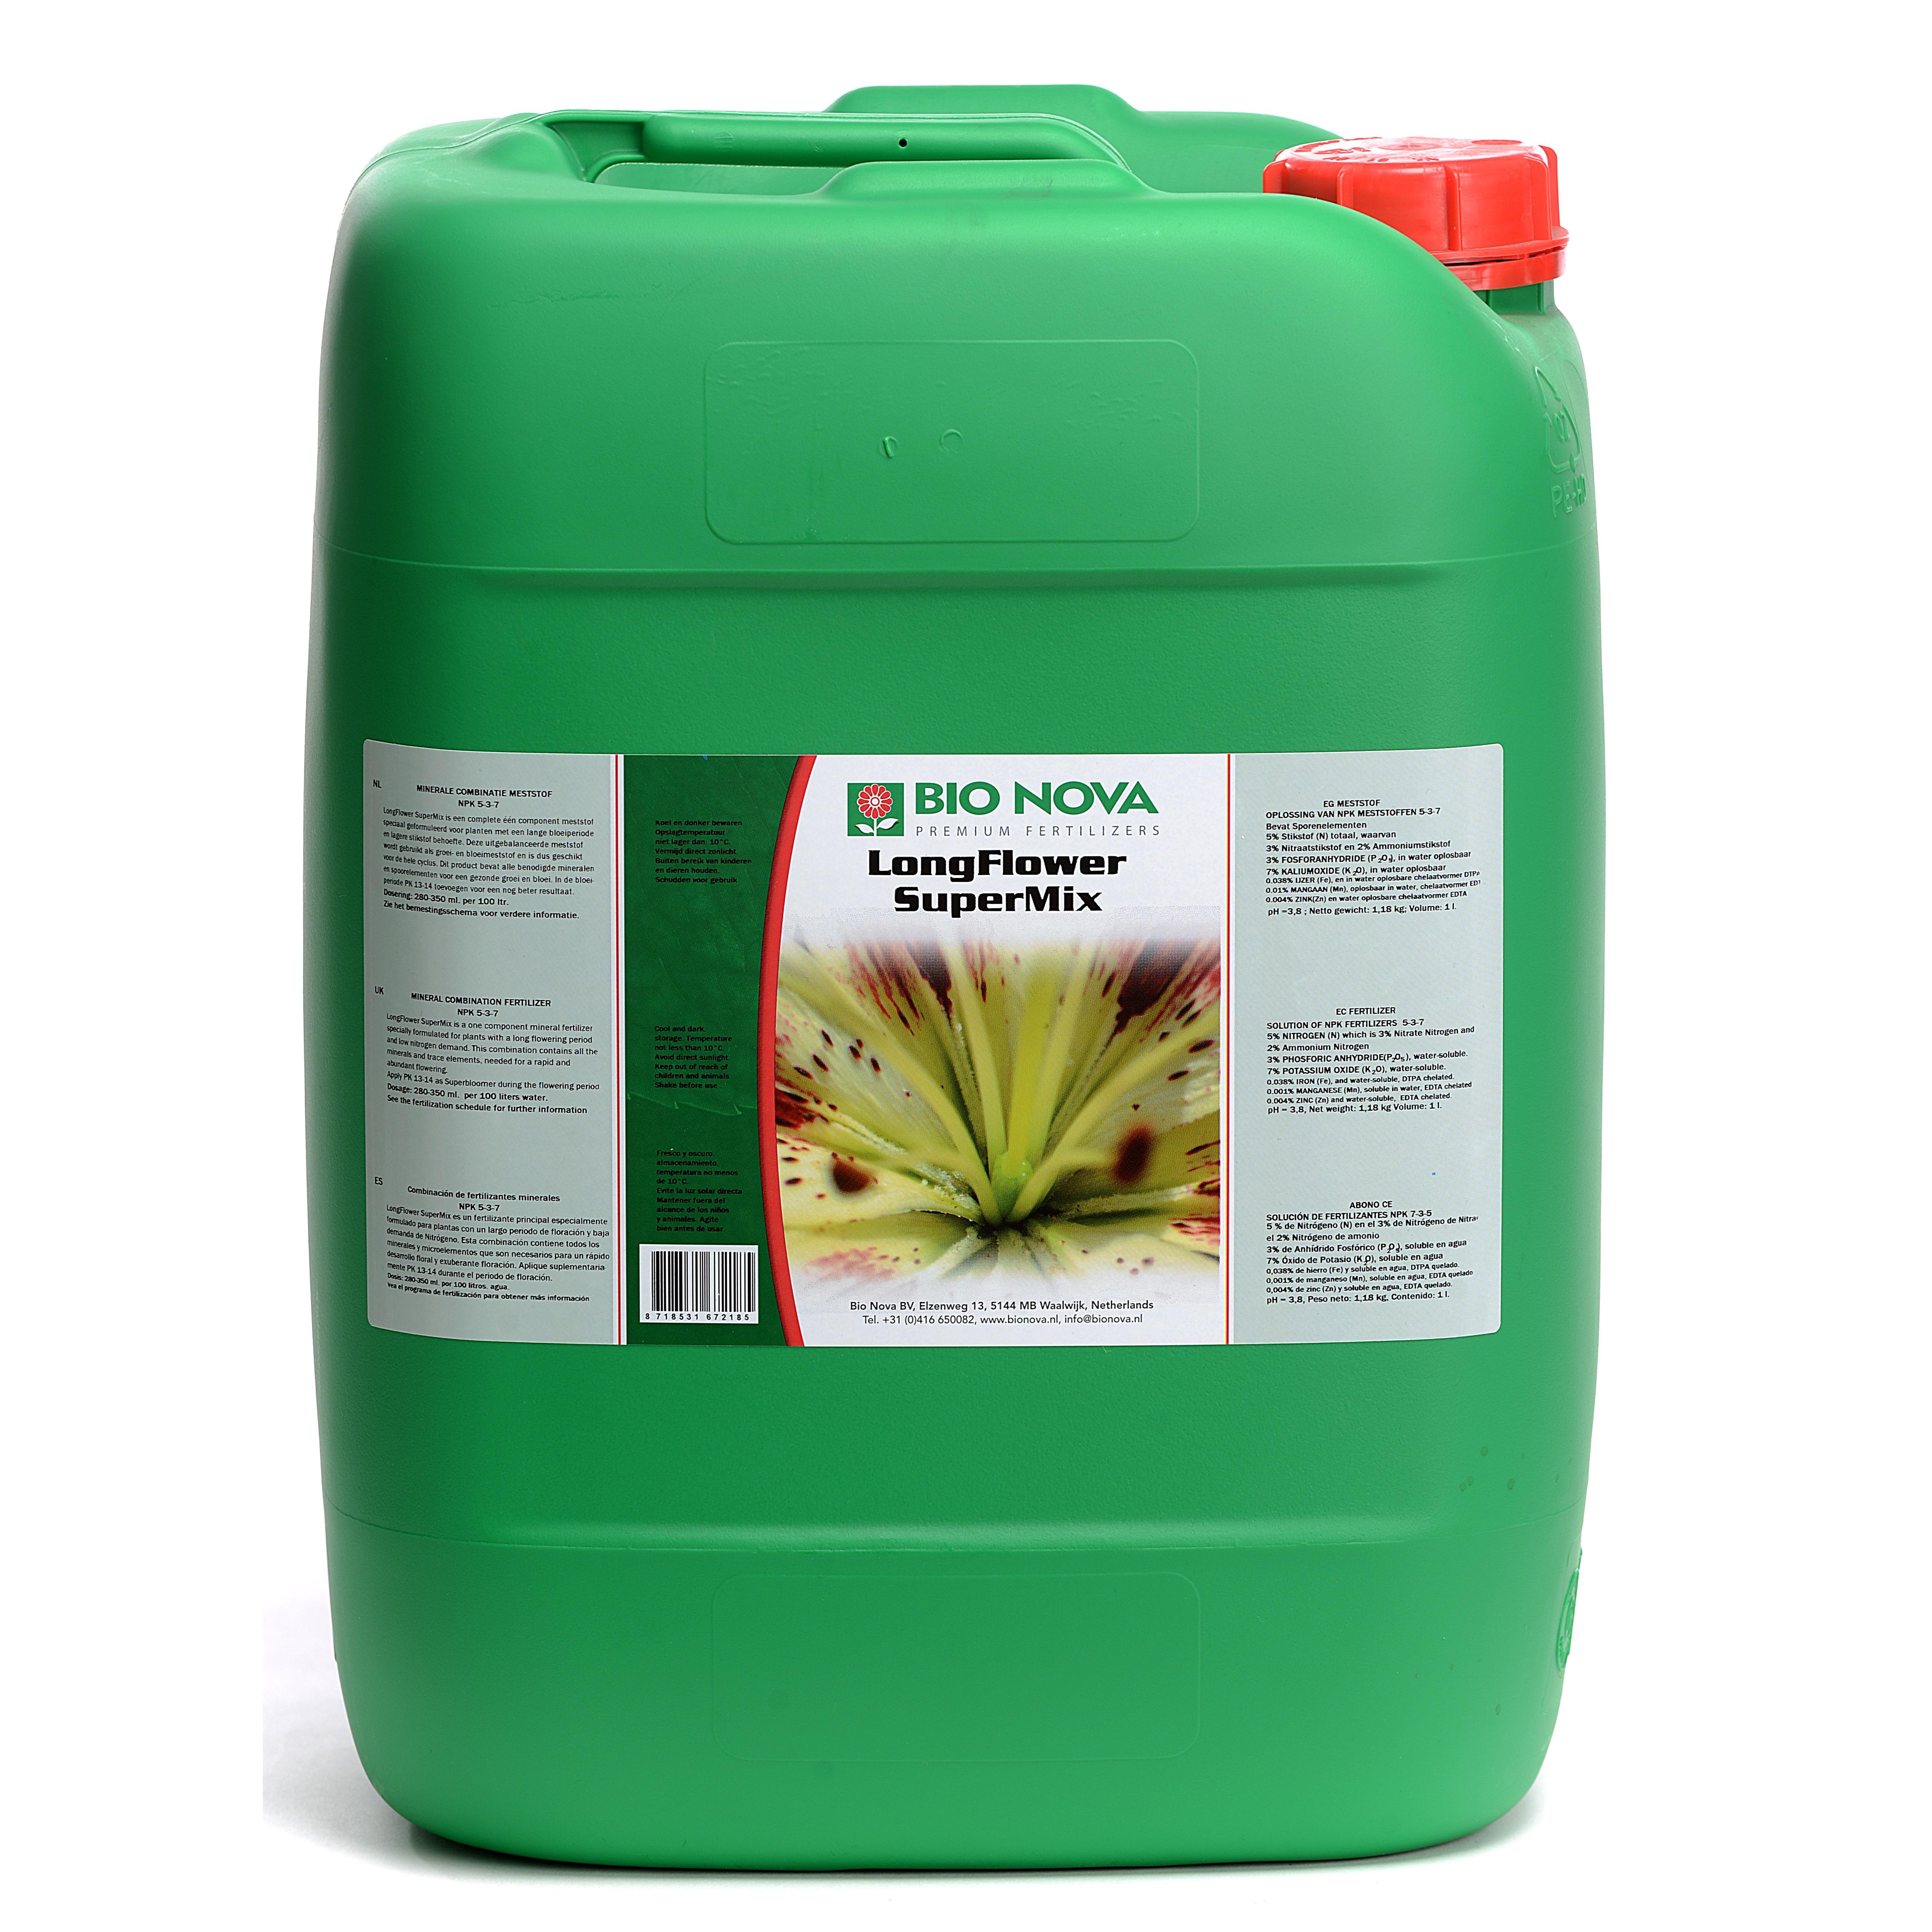 Bio nova BN LongFlower SuperMix 20 Liter